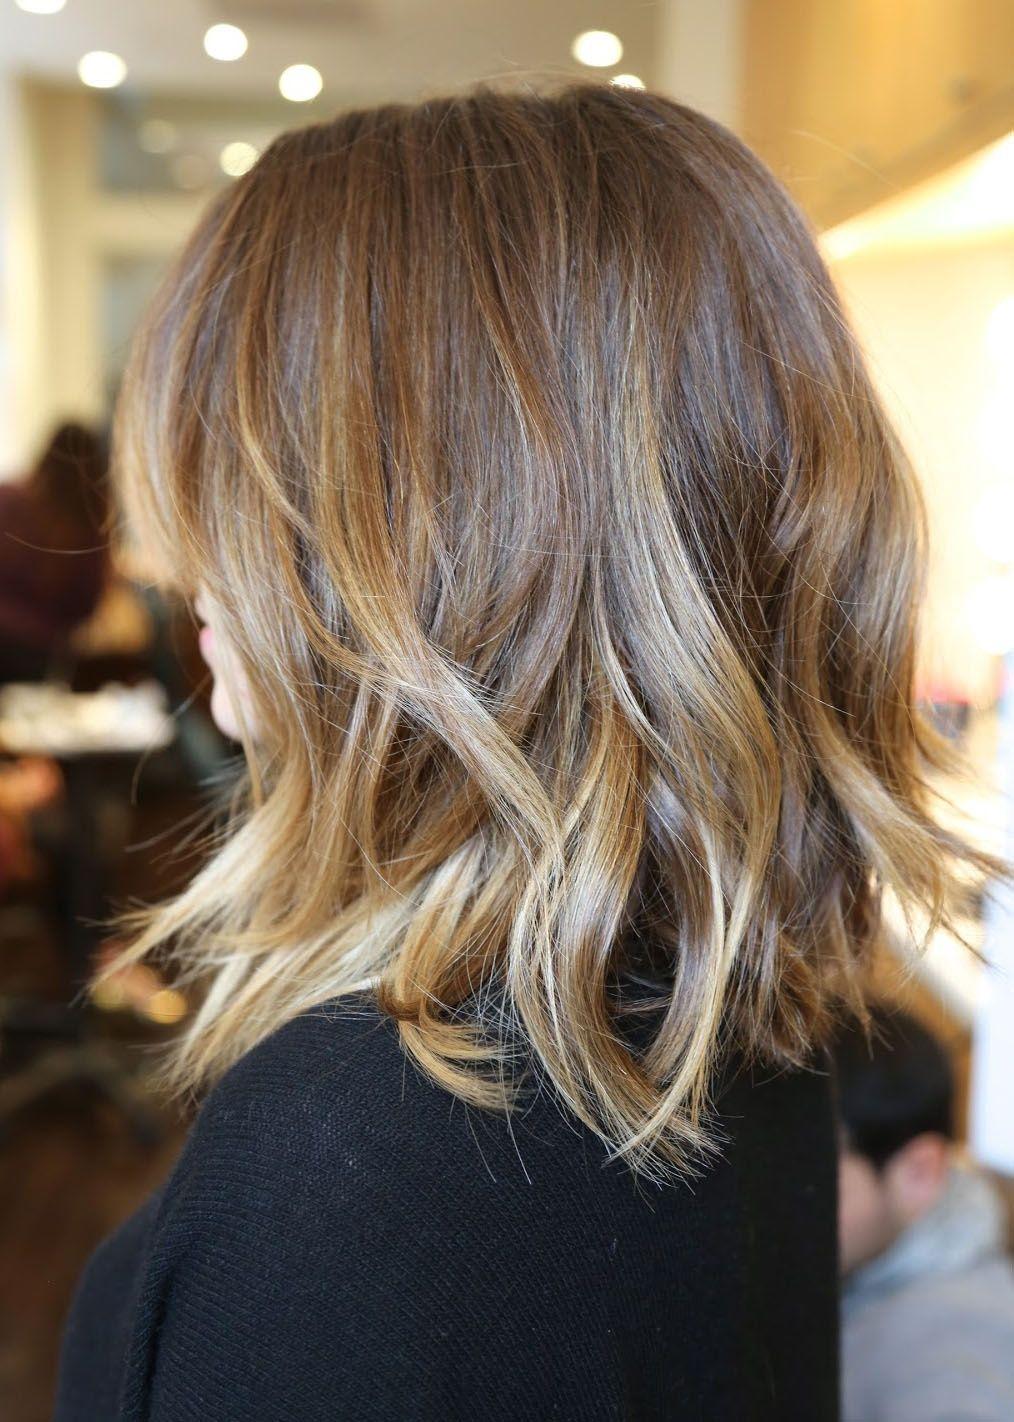 10 Gorgeous Date-Night Hair Ideas FromPinterest